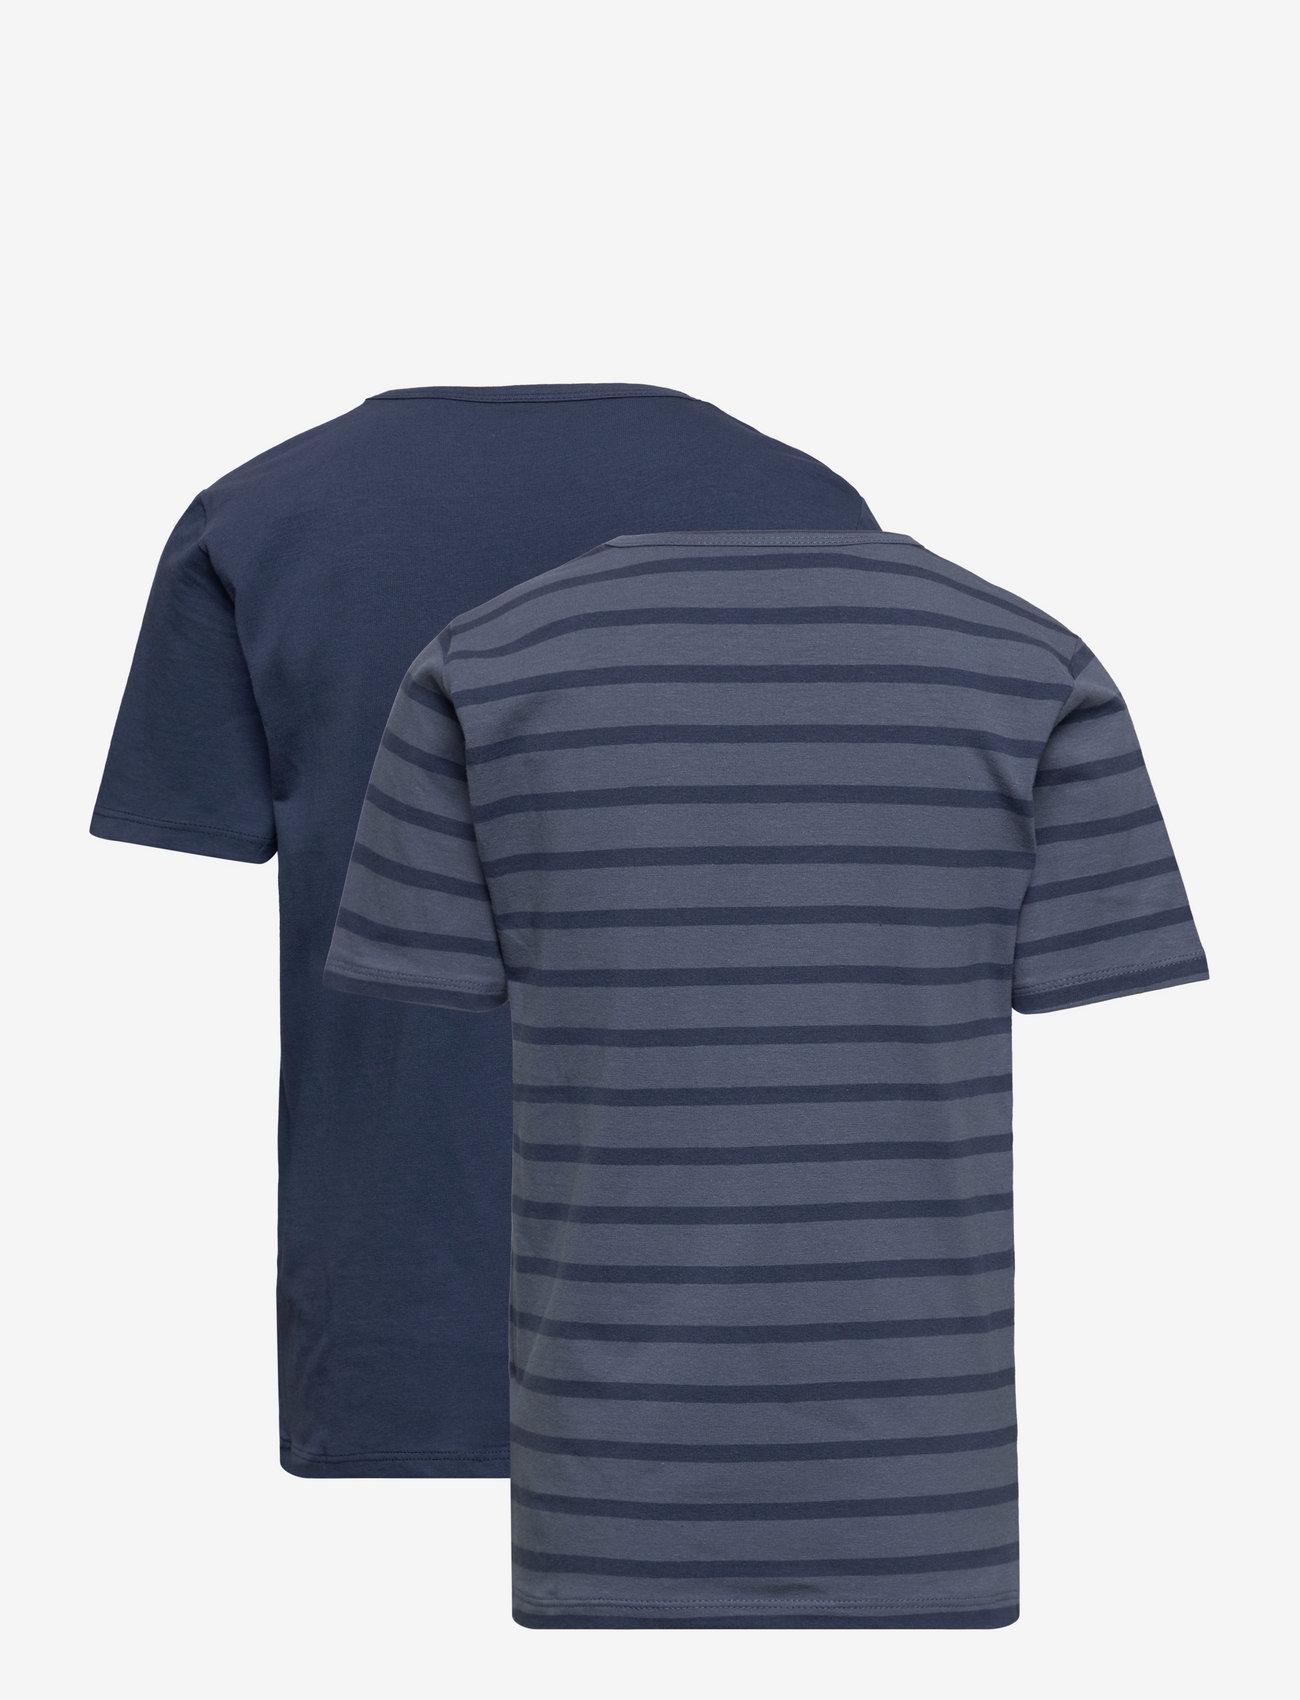 Minymo - Basic 32 -T-shirt SS (2-pack) - t-krekli ar īsām piedurknēm - new navy - 1